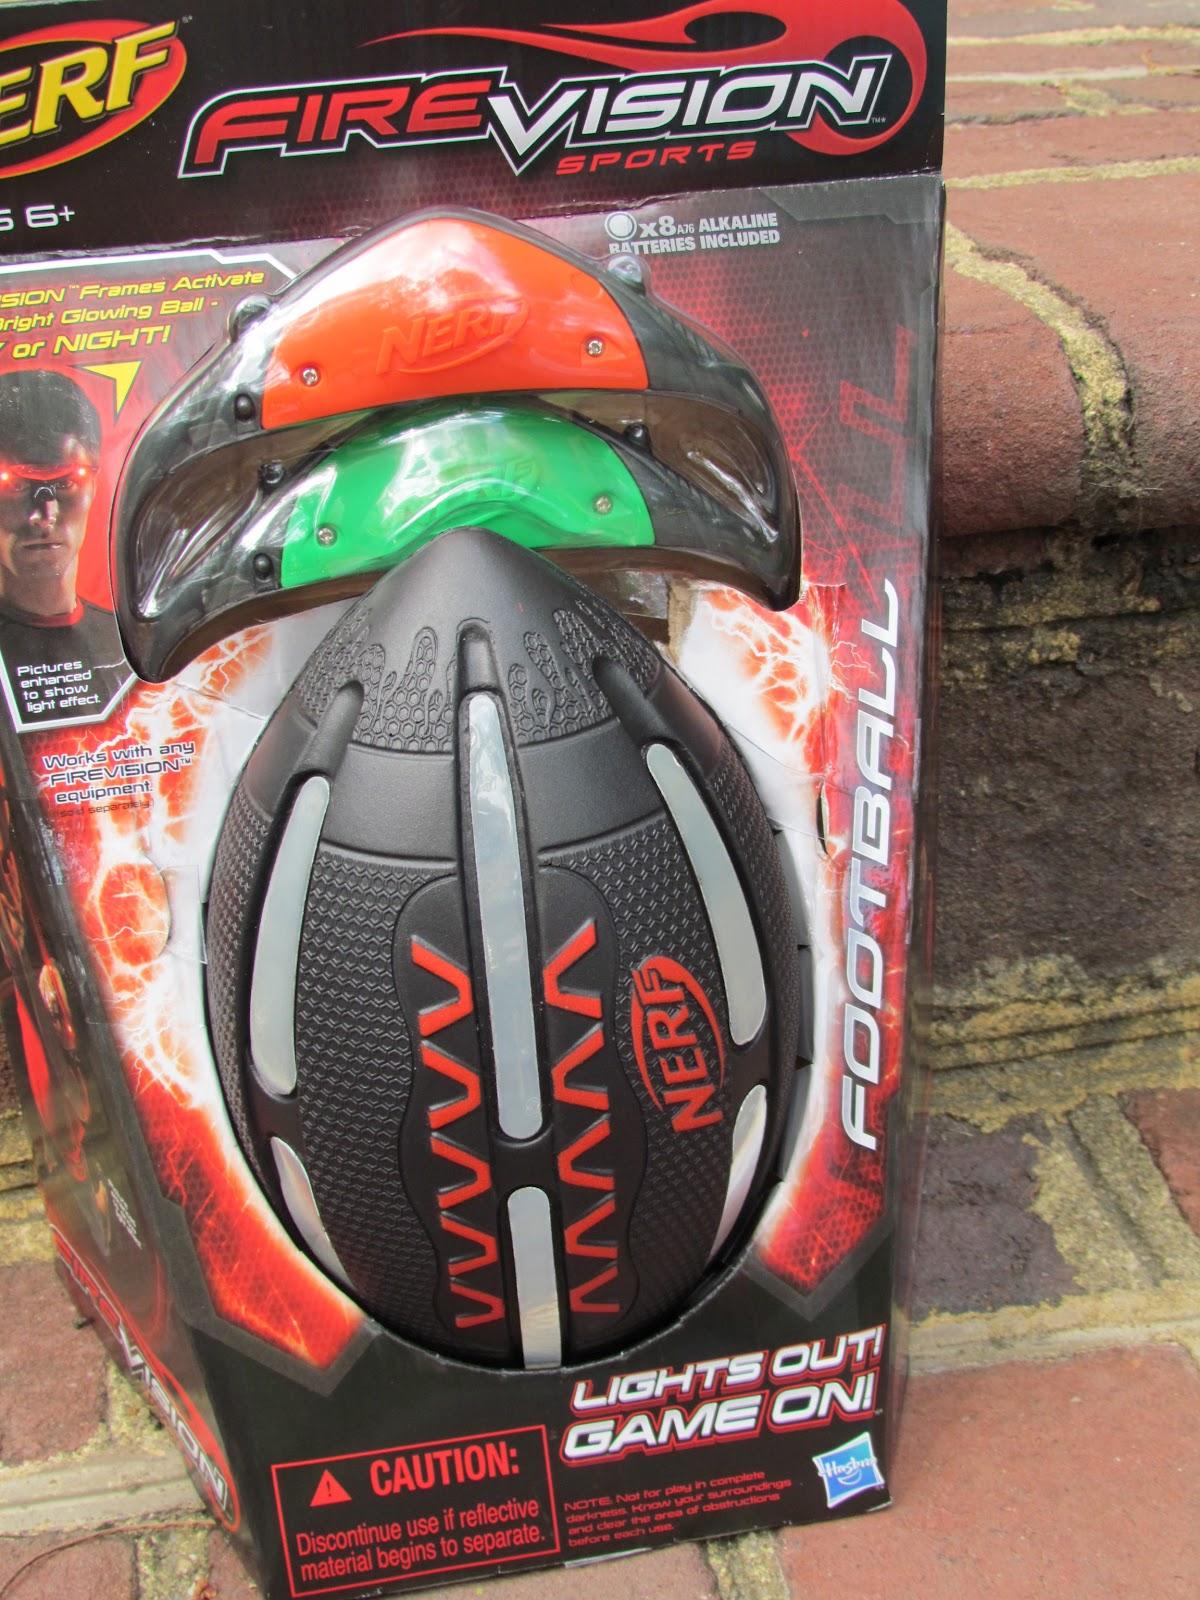 Football Toys For Boys : Nerf nite fire vision football